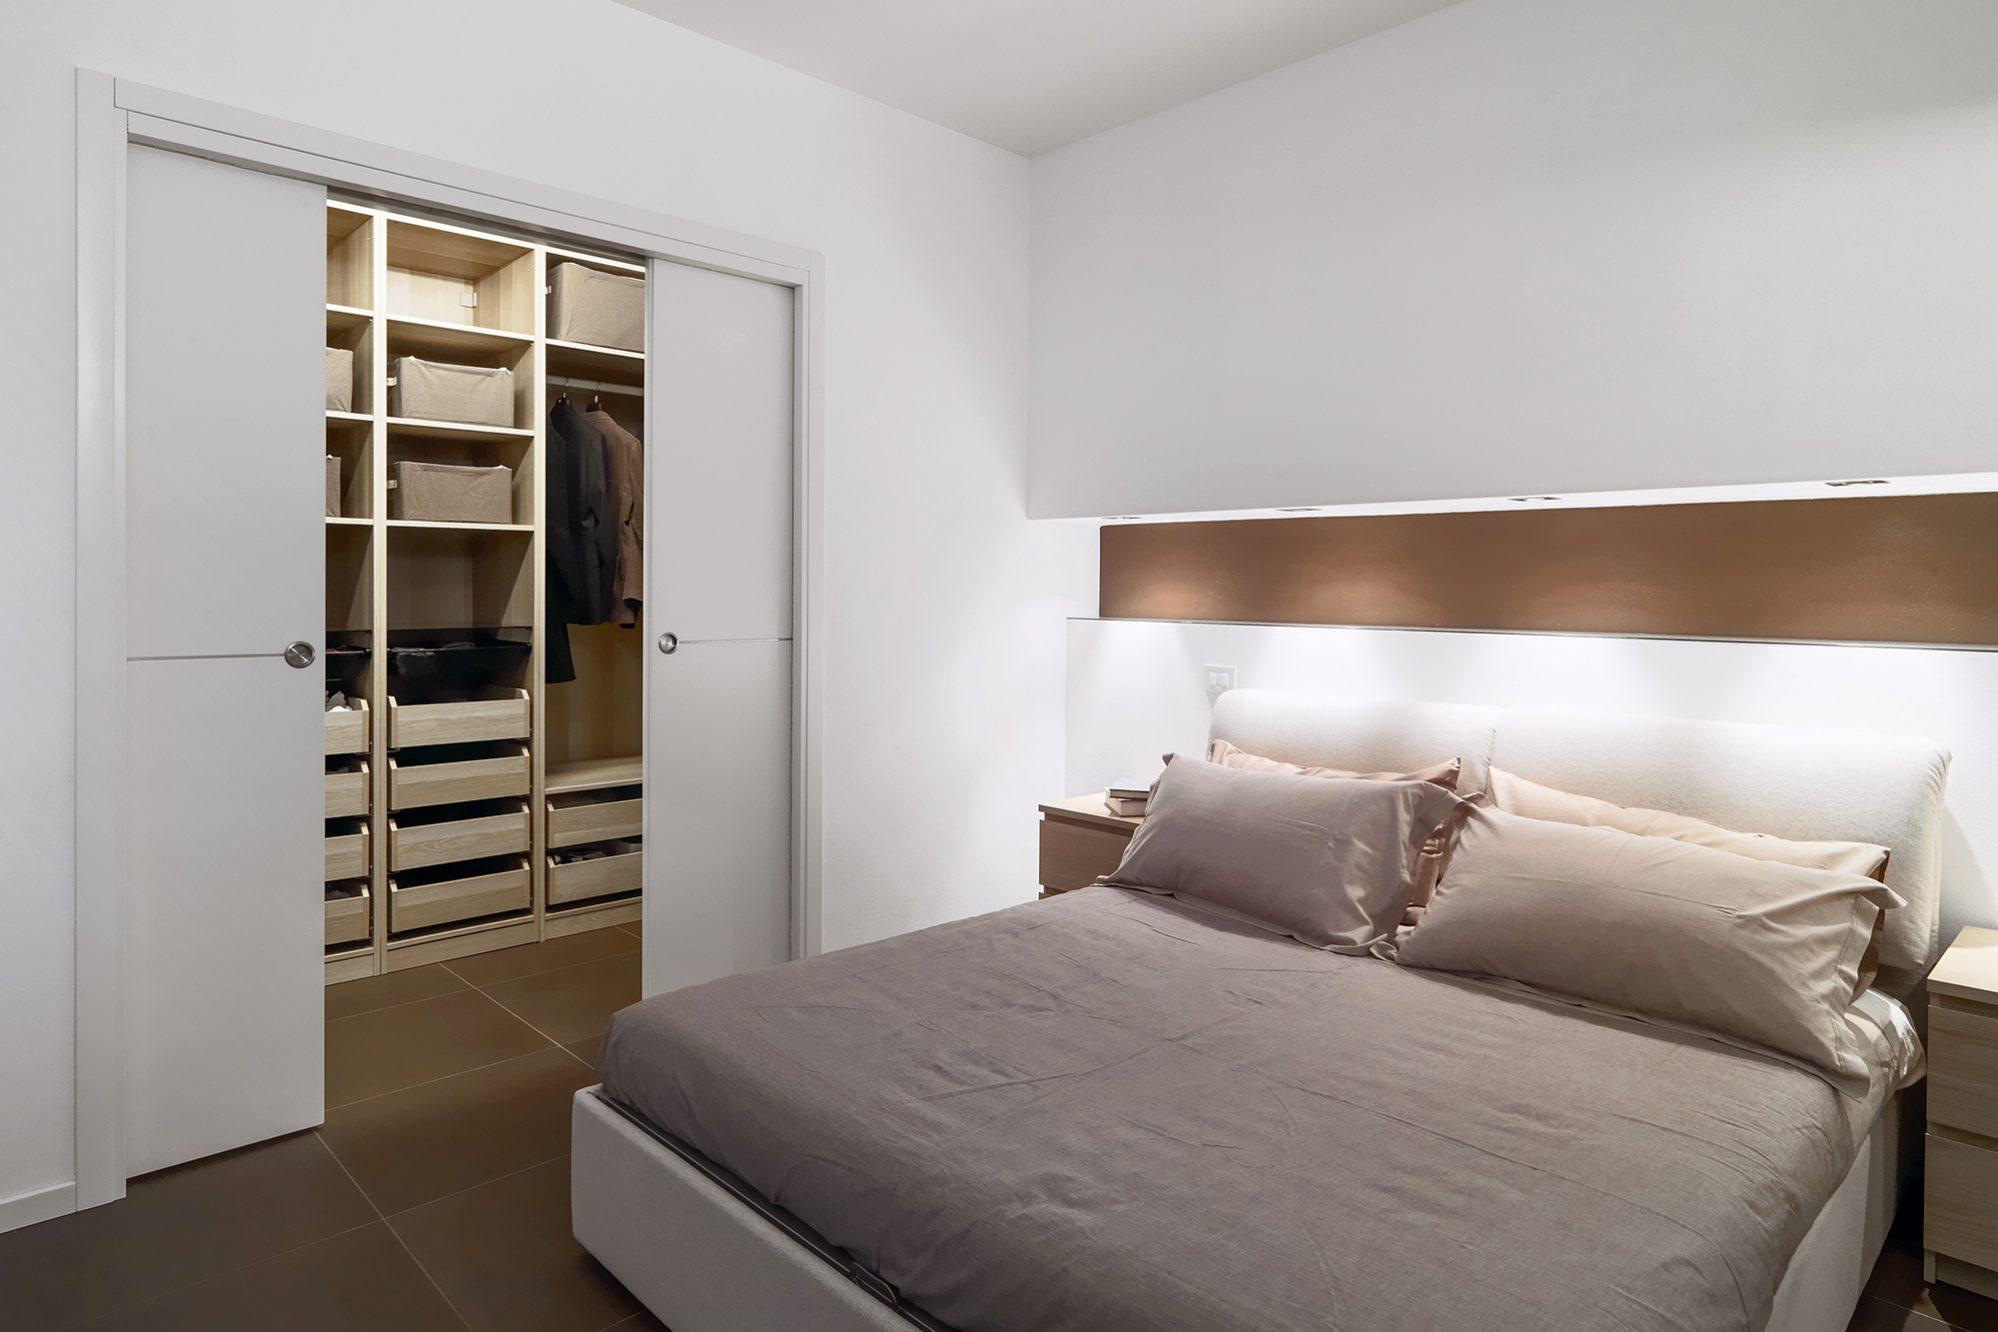 Armstrong Jordan Bespoke Bedrooms